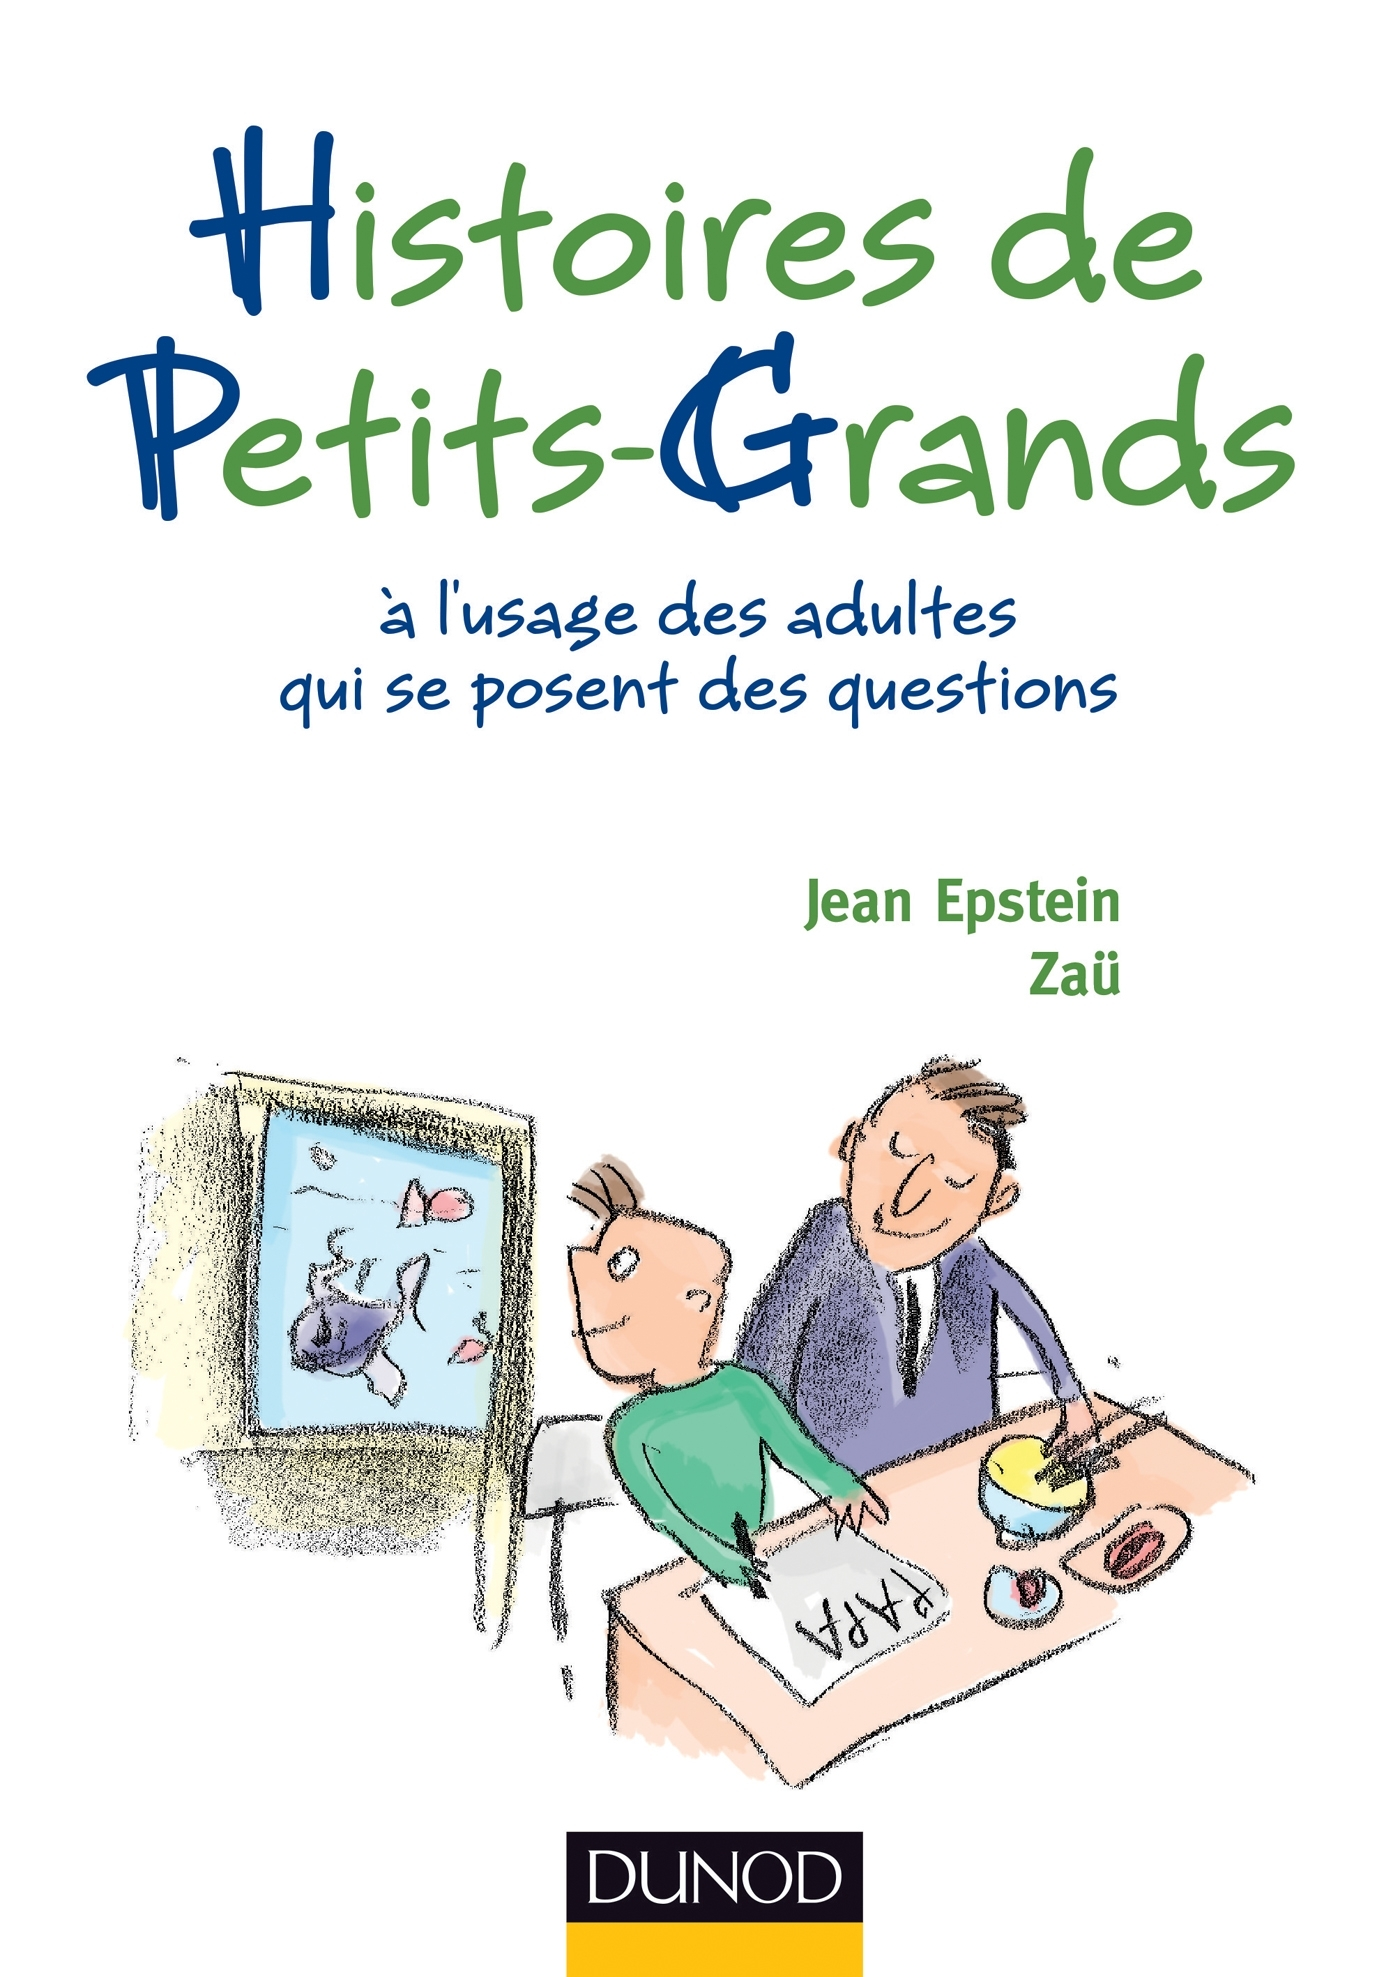 HISTOIRES DE PETITS-GRANDS - A L'USAGE DES ADULTES QUI SE POSENT DES QUESTIONS